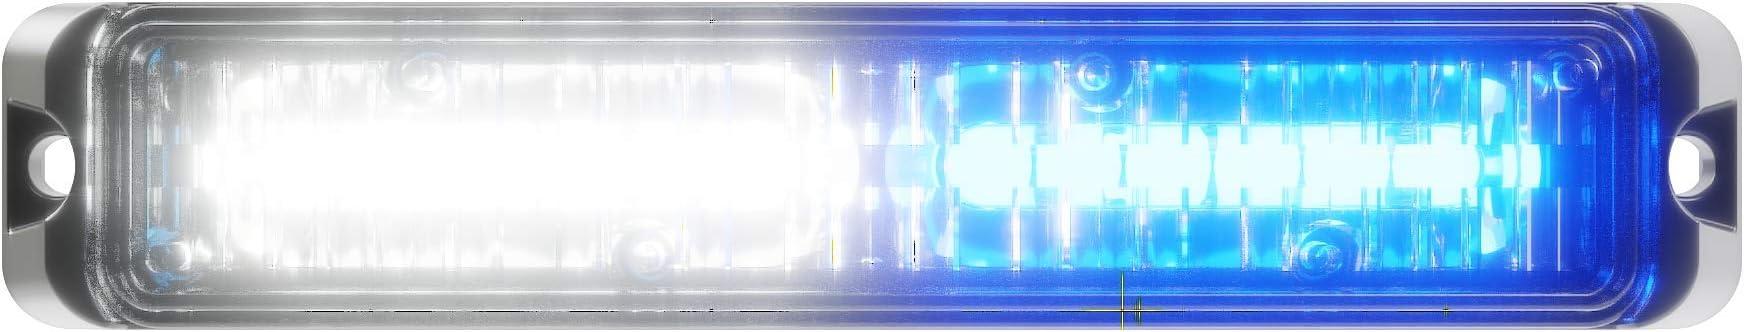 Blue//White 12 LED Volunteer Firefighter POV Vehicle Truck LED Hideaway Surface Mount Strobe Warning Light Abrams SAE Class-1 Blaster 120 36W